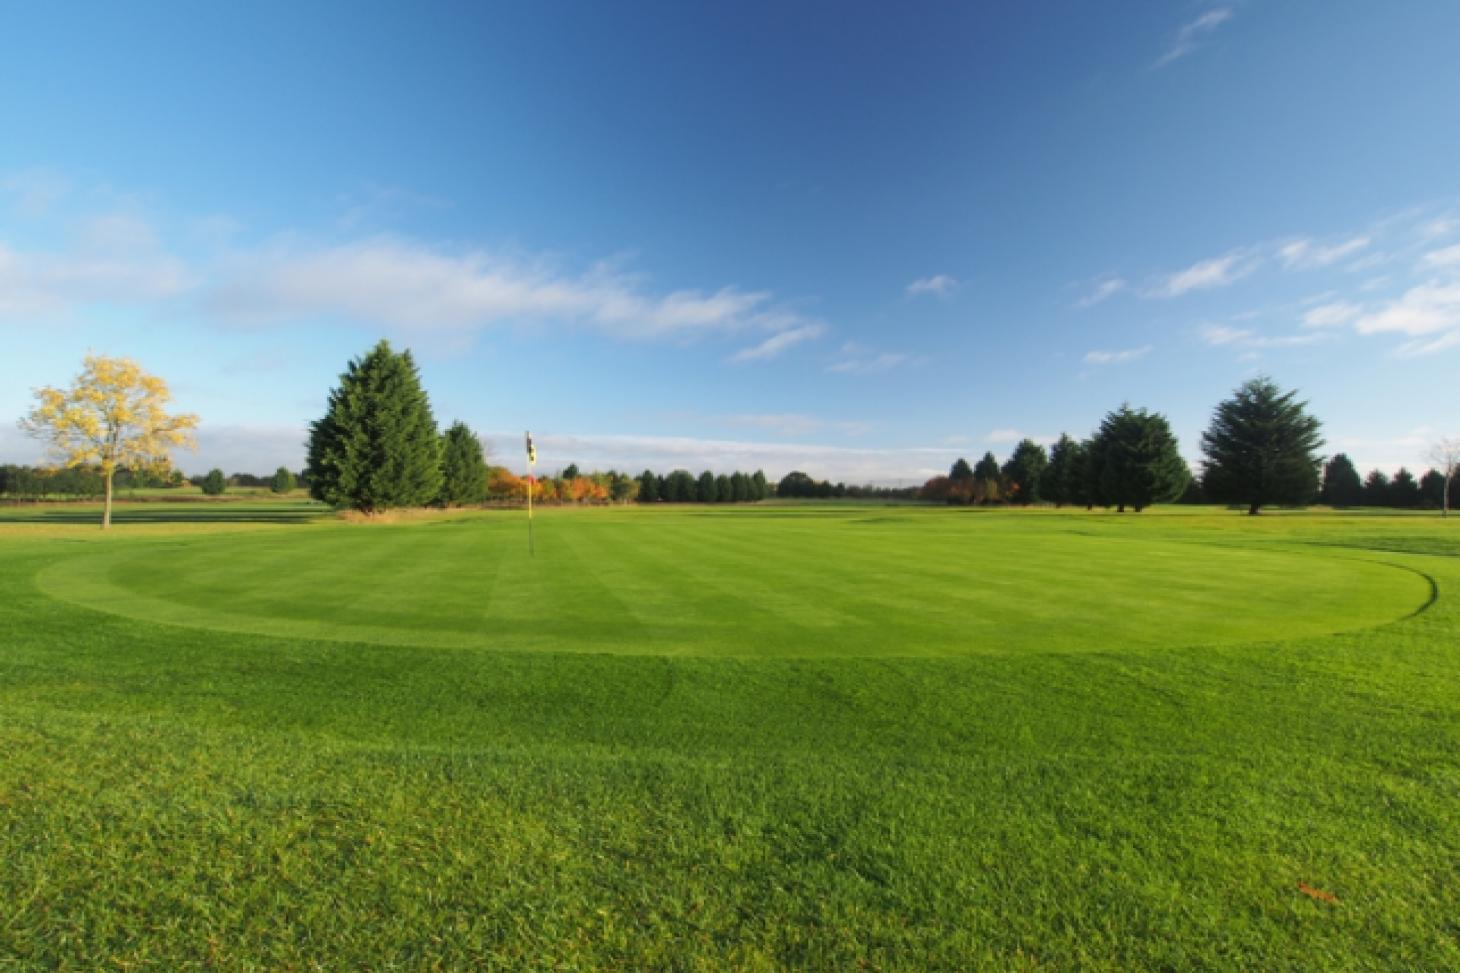 Bird Hills Golf Centre 18 hole | Yes golf course